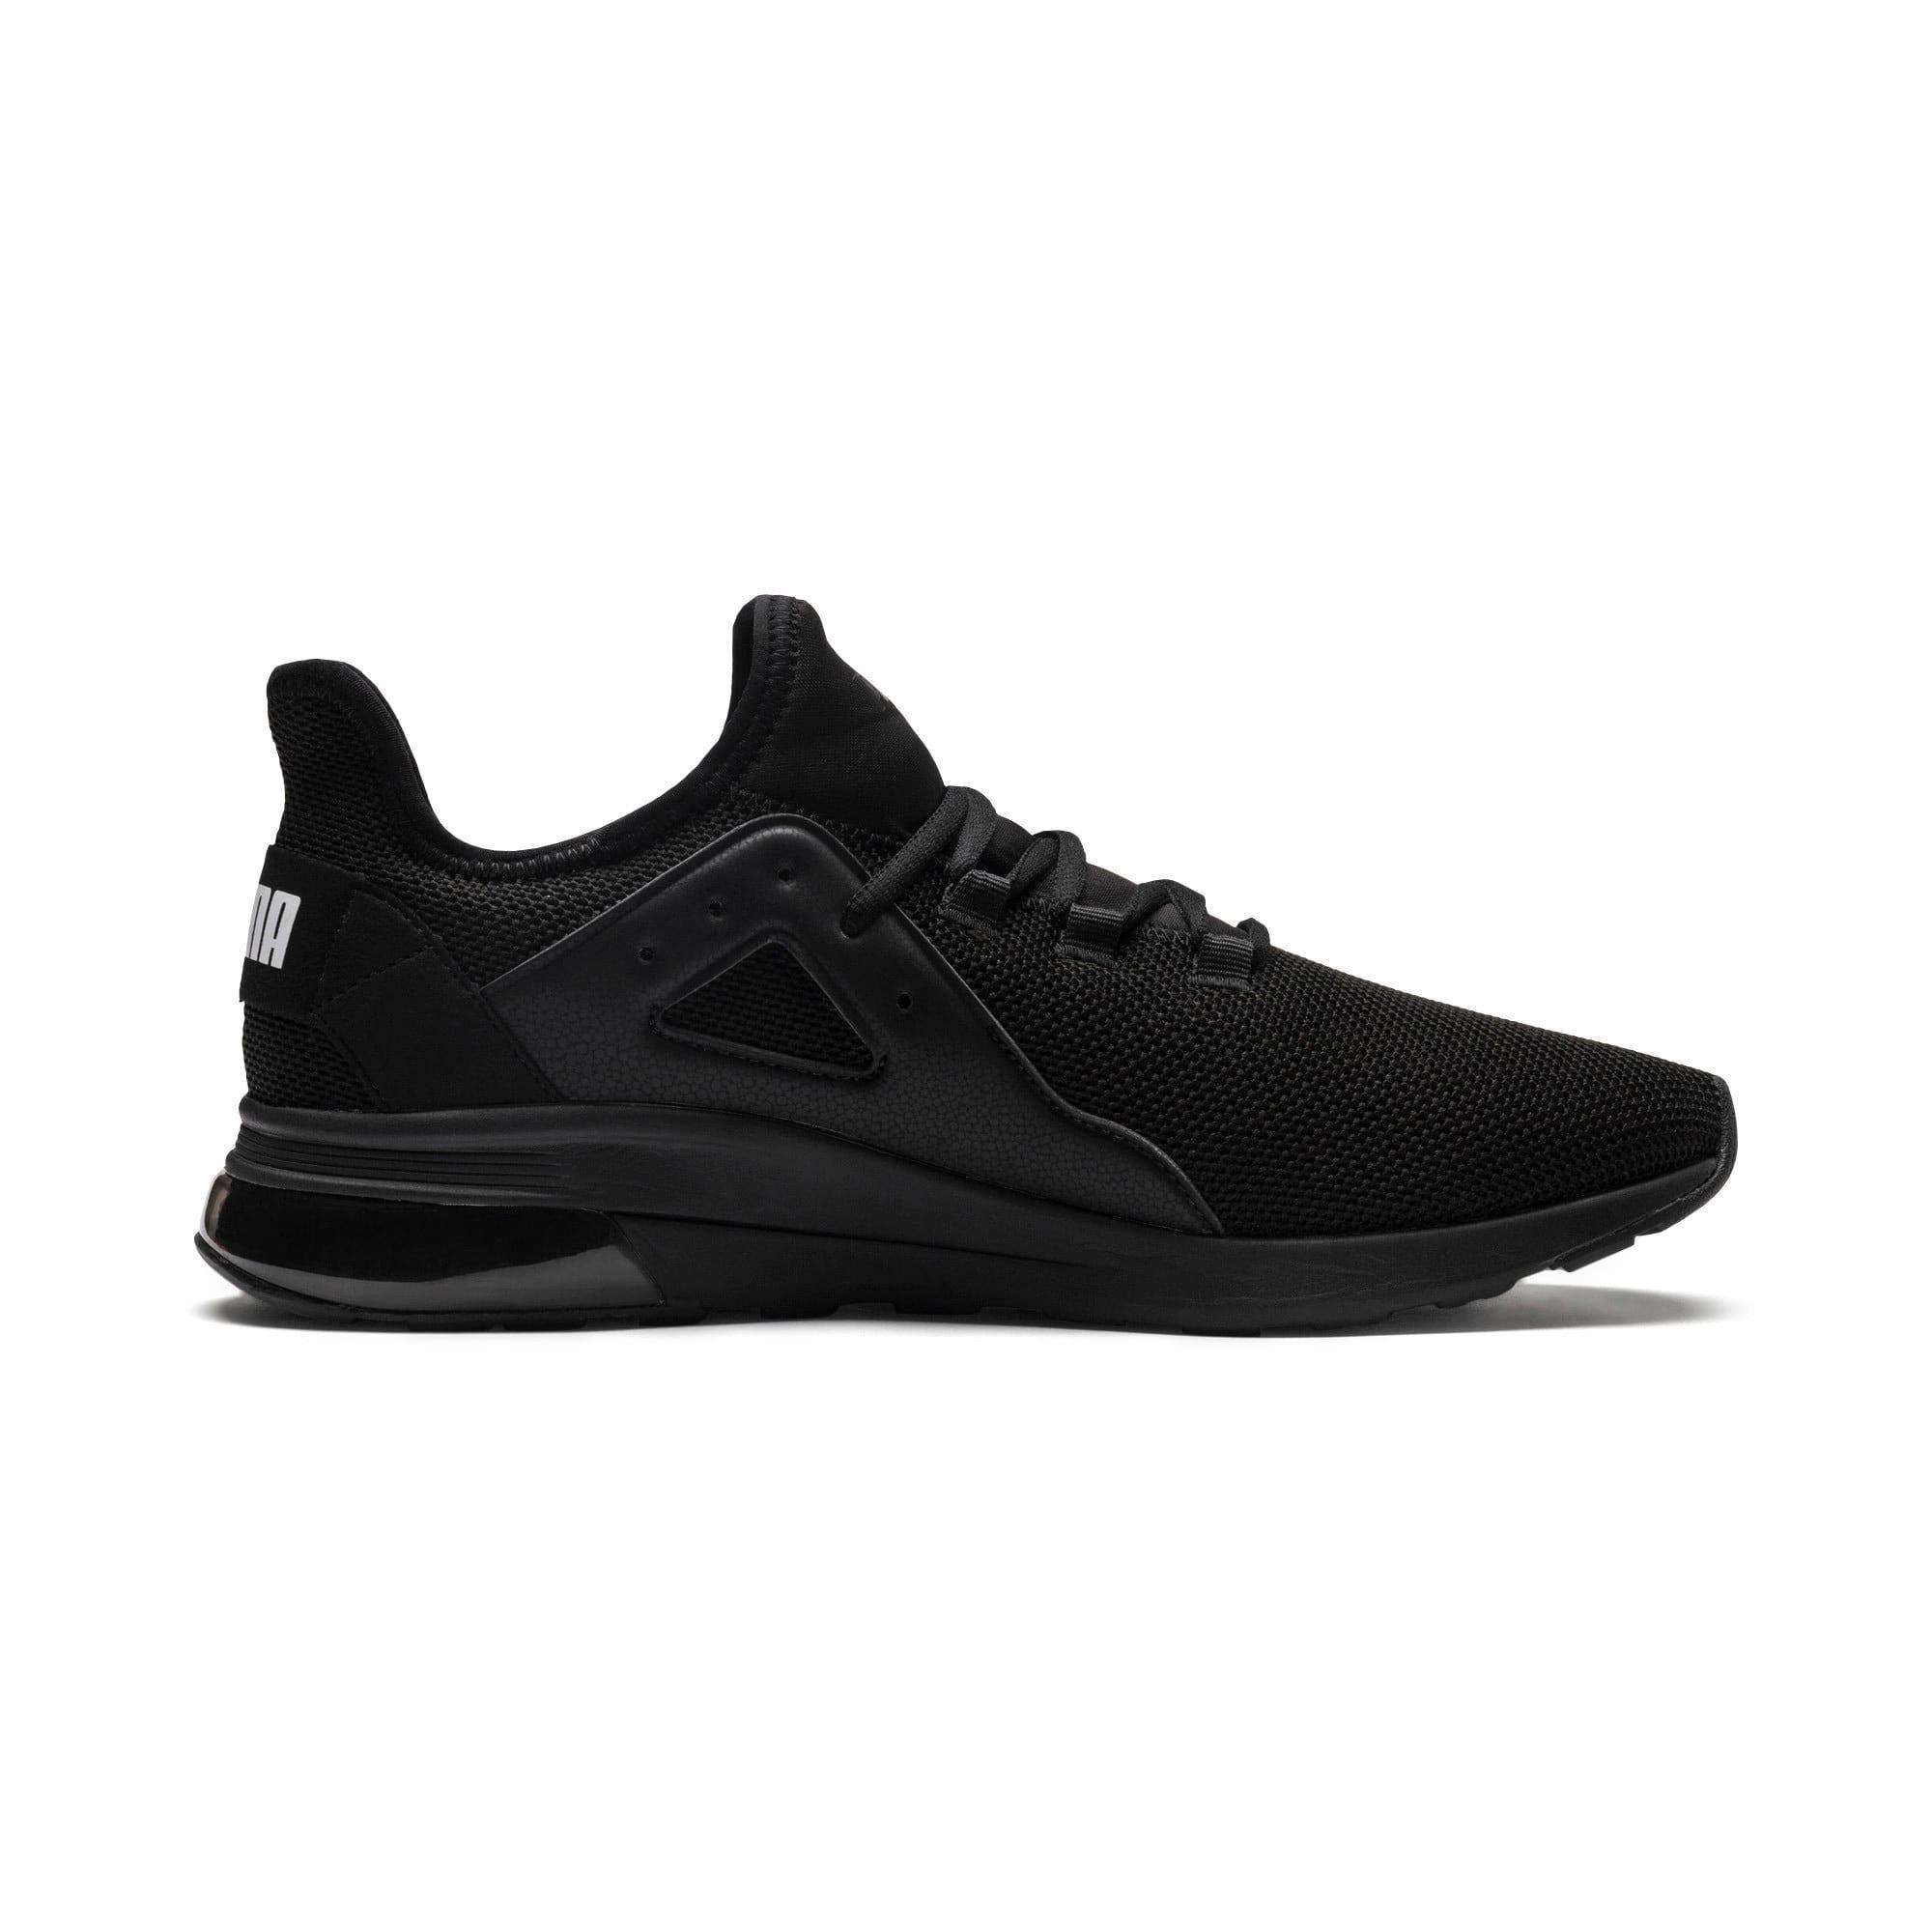 Thumbnail 5 of Electron Street Sneakers, Puma Black-Puma Black-Black, medium